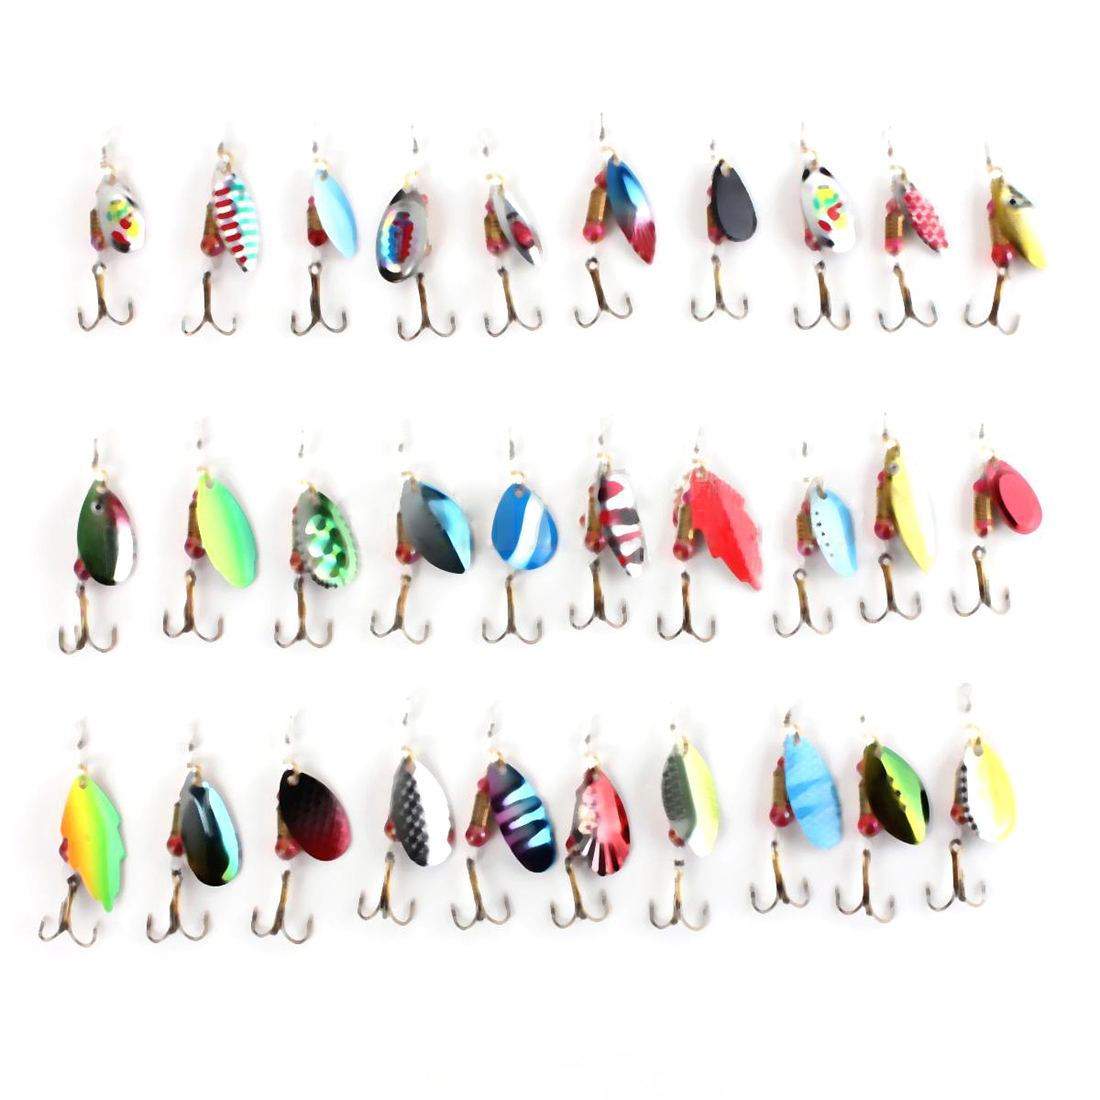 3 Pcs of (30pcs Assorted Fishing Lures Crankbaits Spinner Baits Hook Minnow Tackle USA) 3pcs lot fishing lures mixed set minnow crankbaits topwater popper hook lure spinner baits crankbait bass wobbler tackle hook